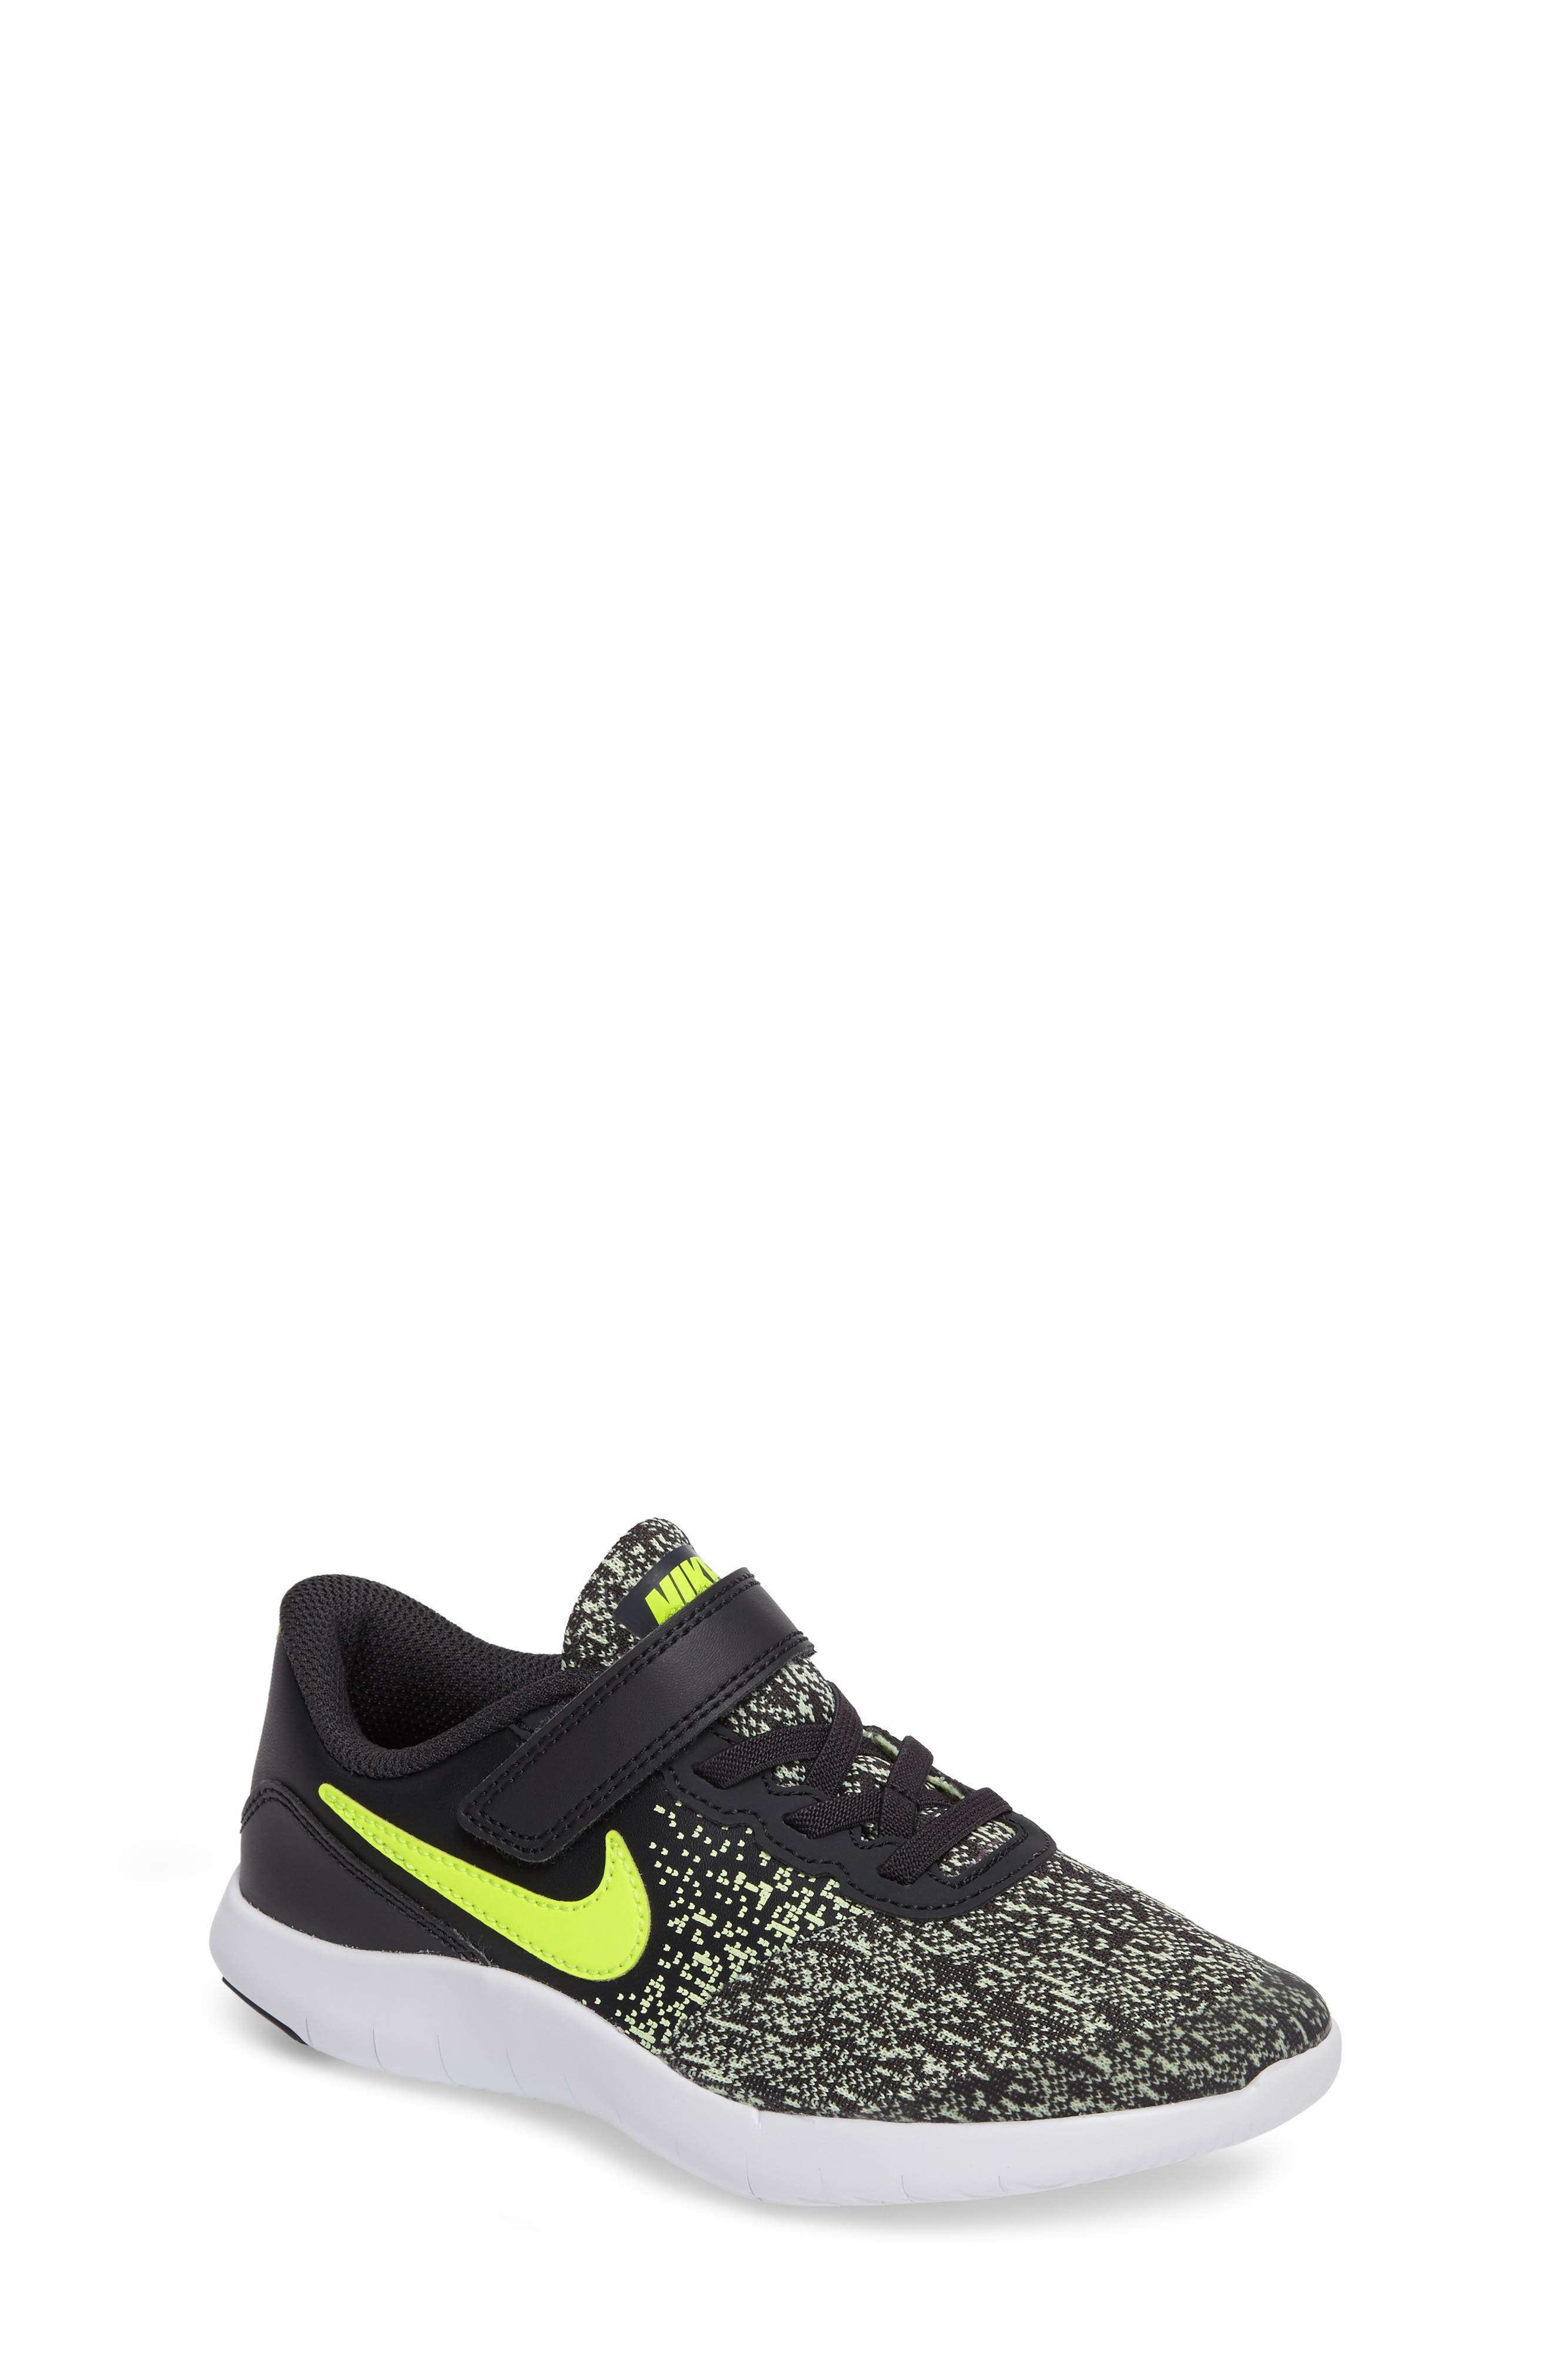 Alternate Image 1 Selected - Nike Flex Contact Running Shoe (Toddler & Little Kid)